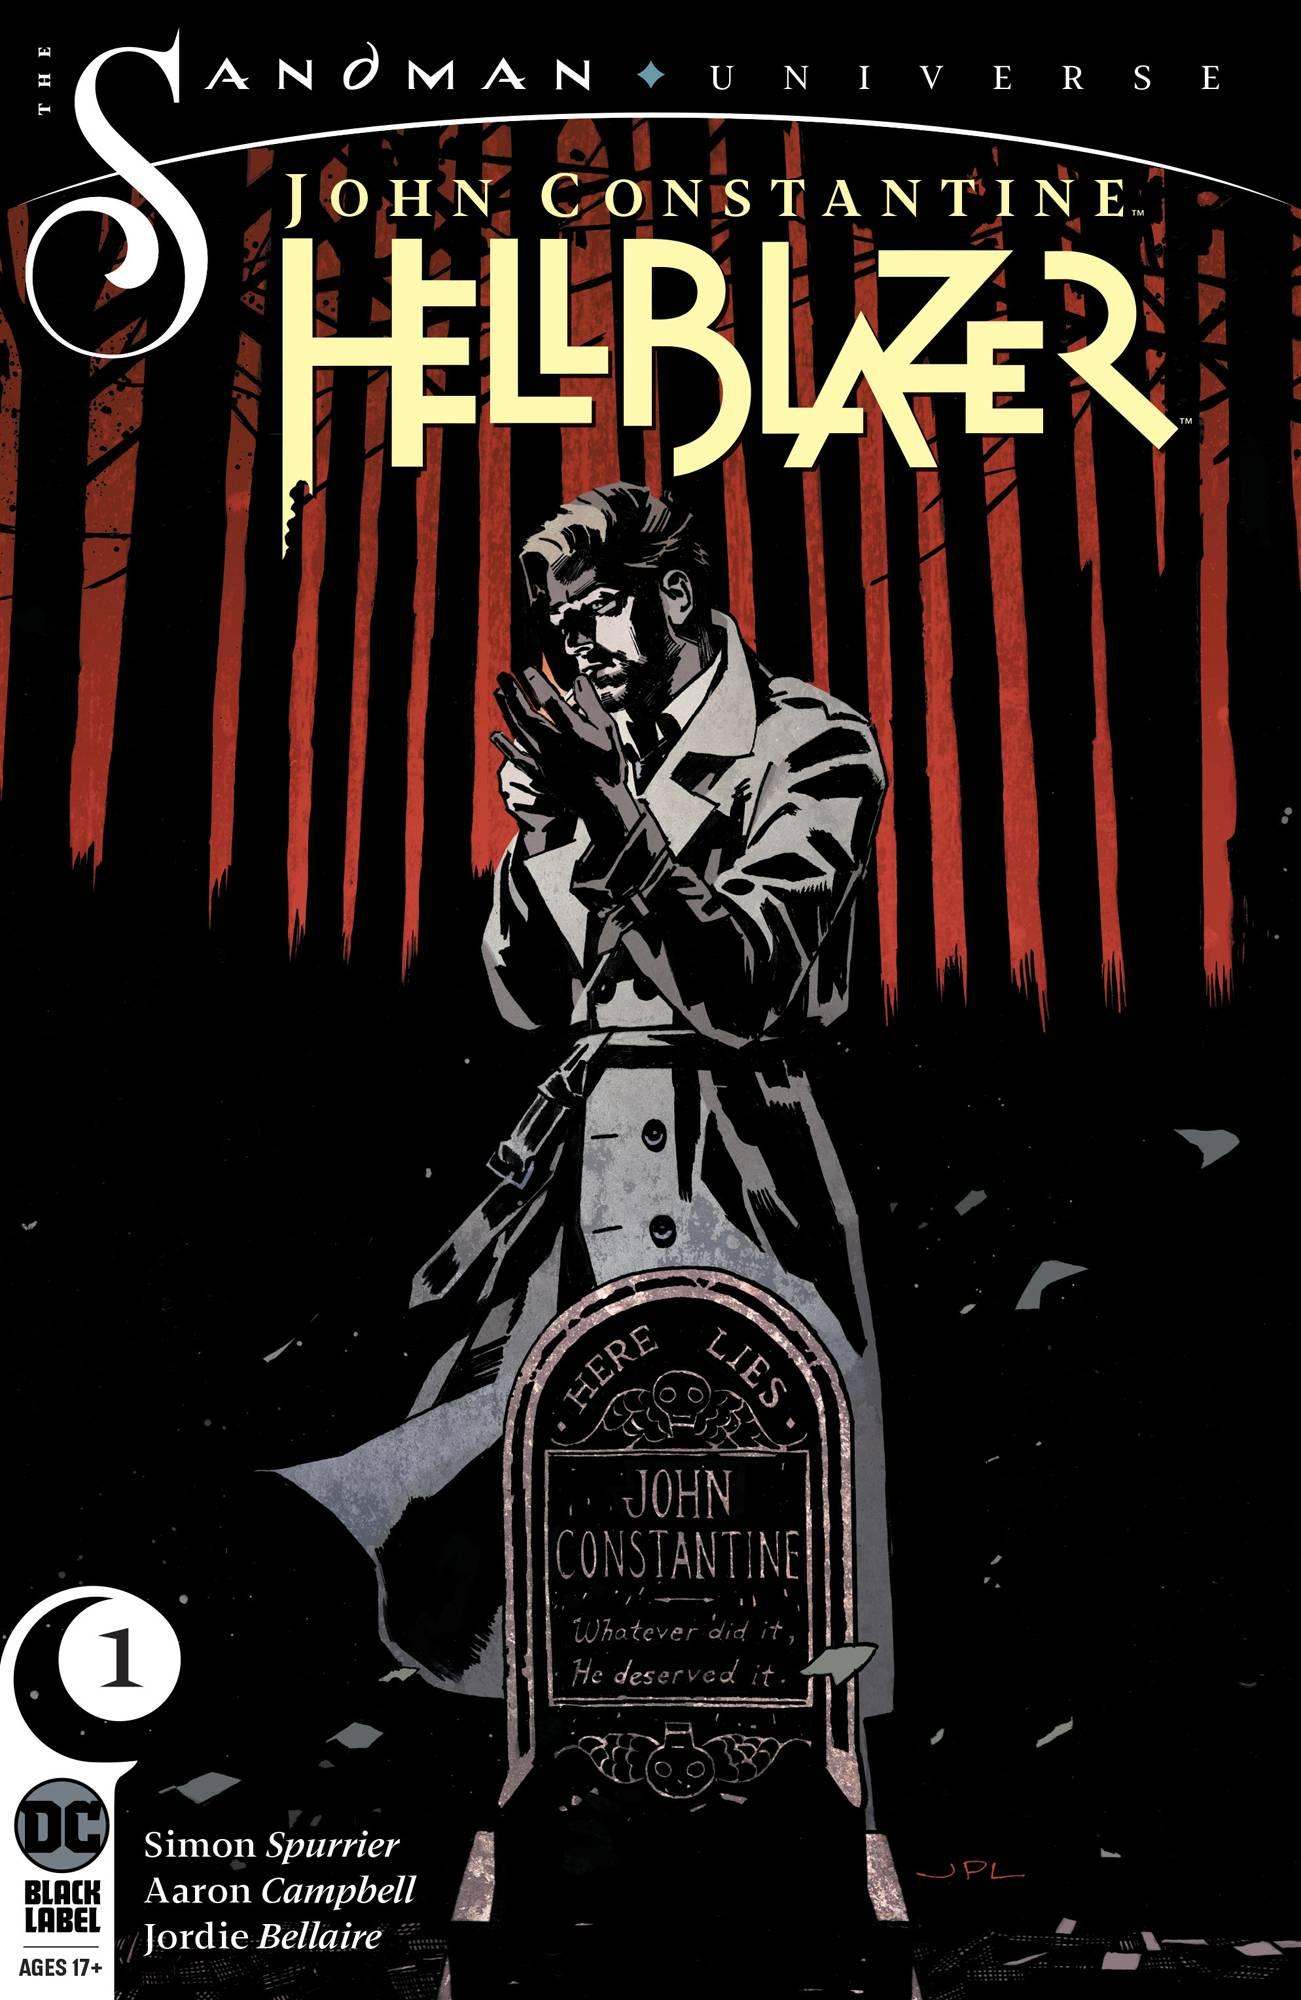 John Constantine Hellblazer #1 (2019)